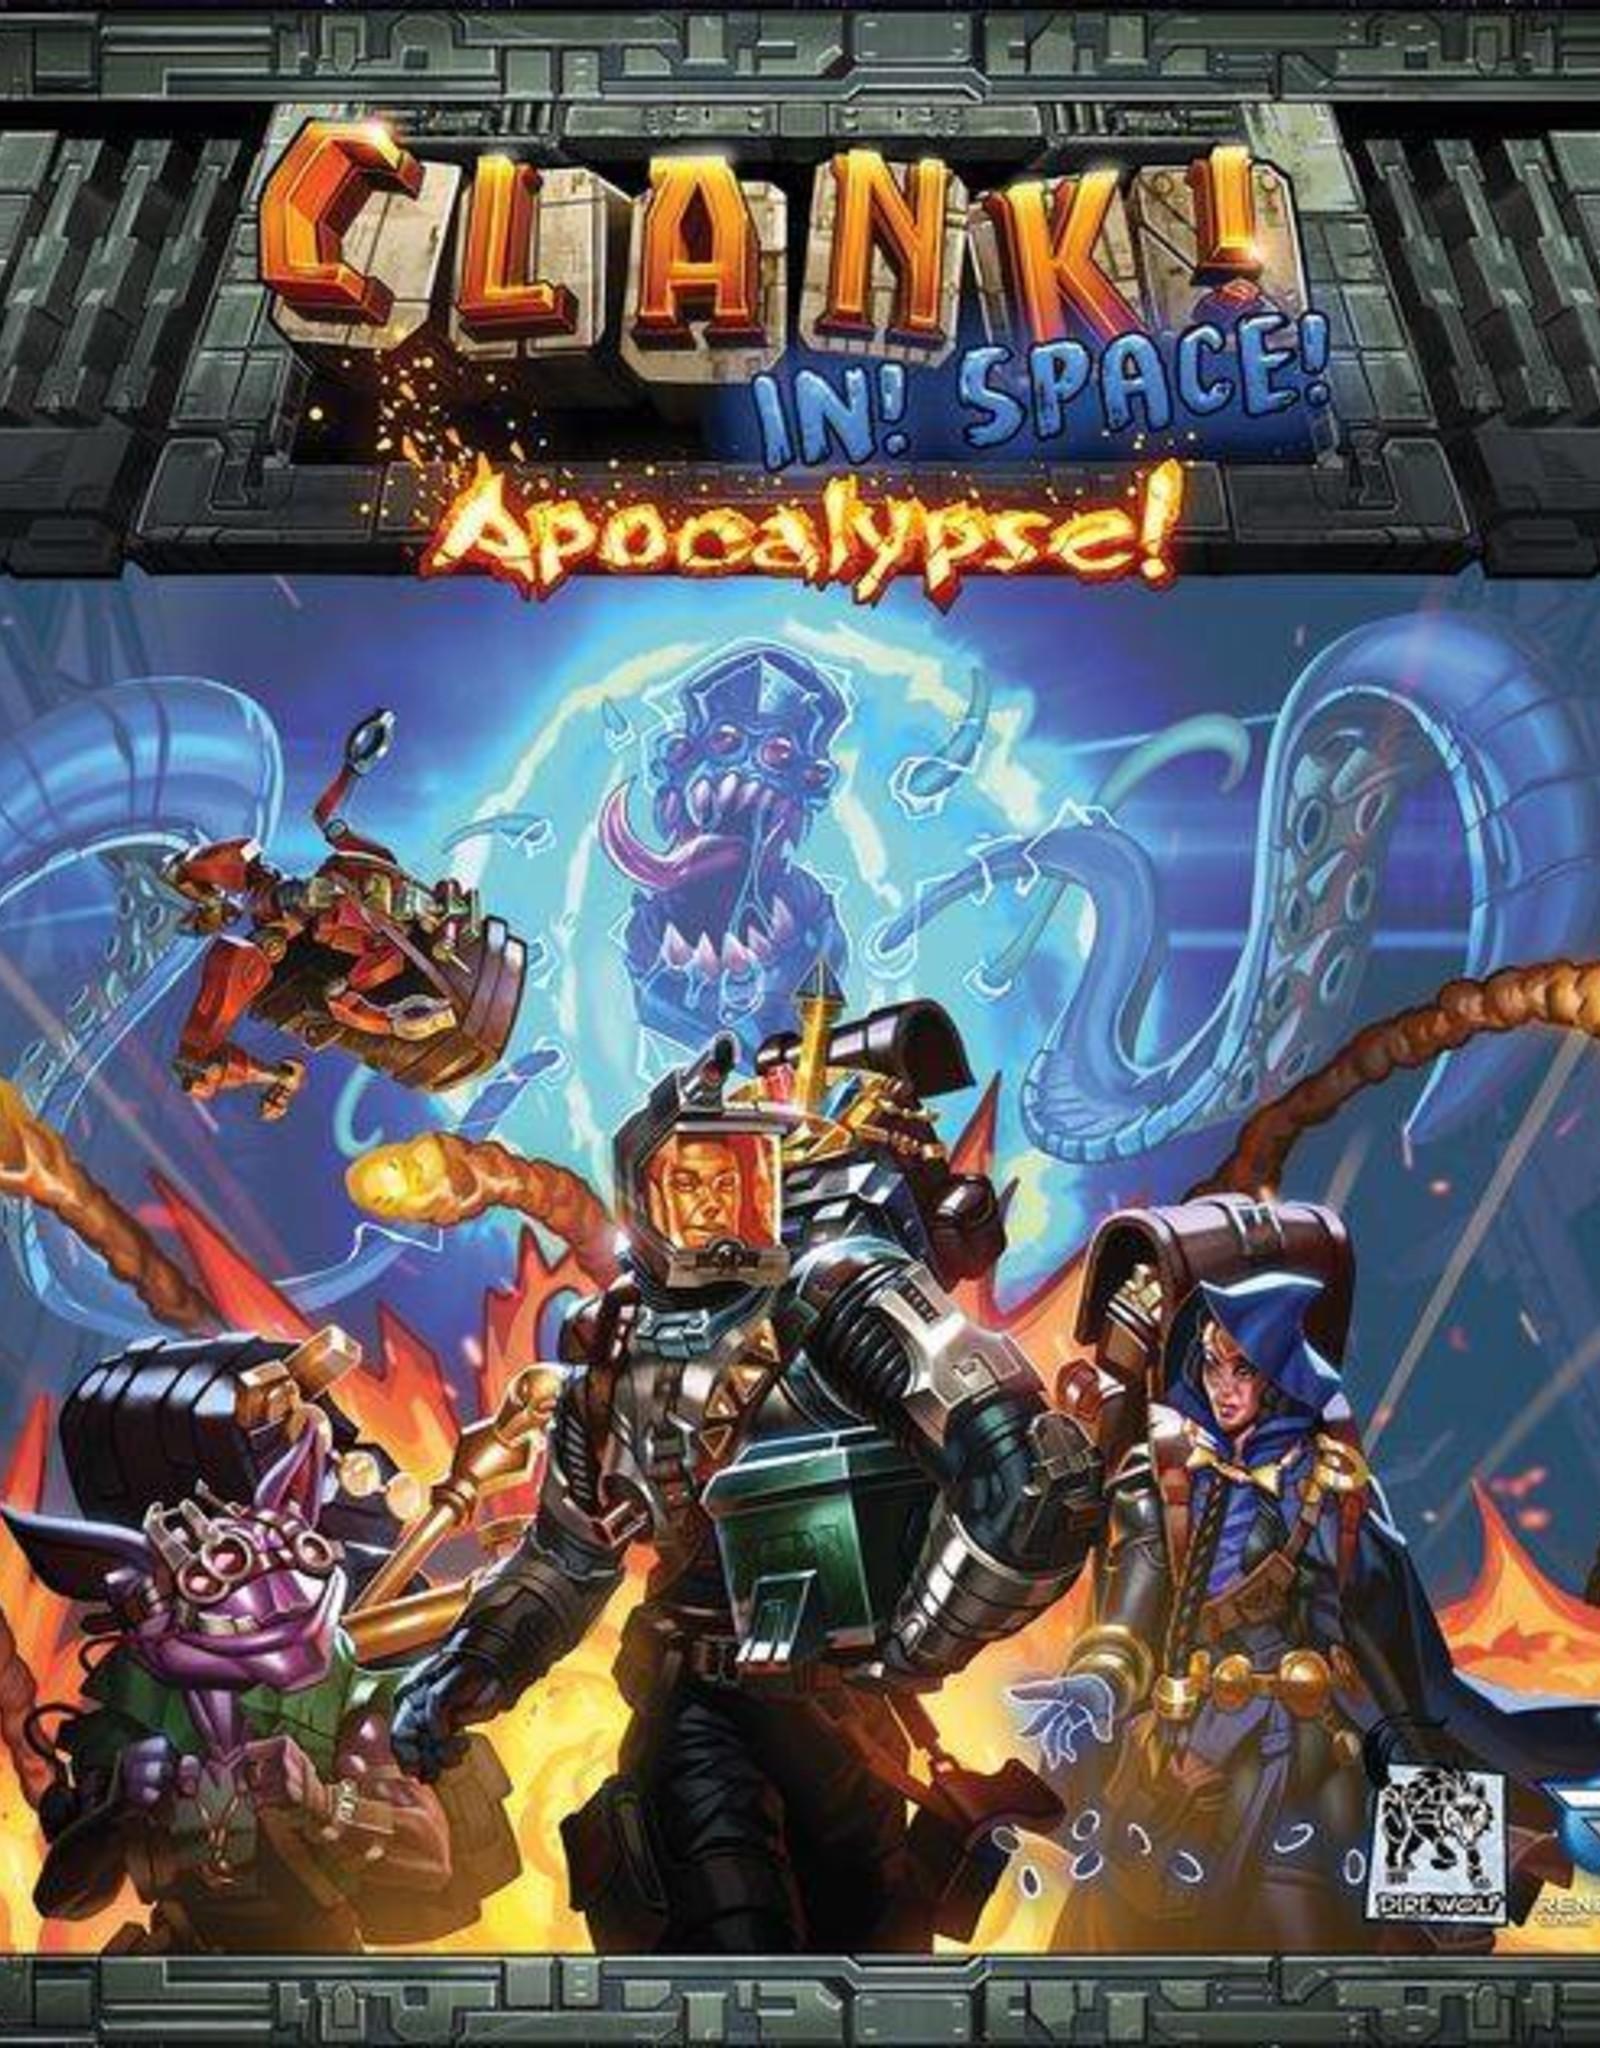 RENEGADE GAME STUDIOS CLANK! IN SPACE APOCALYPSE!